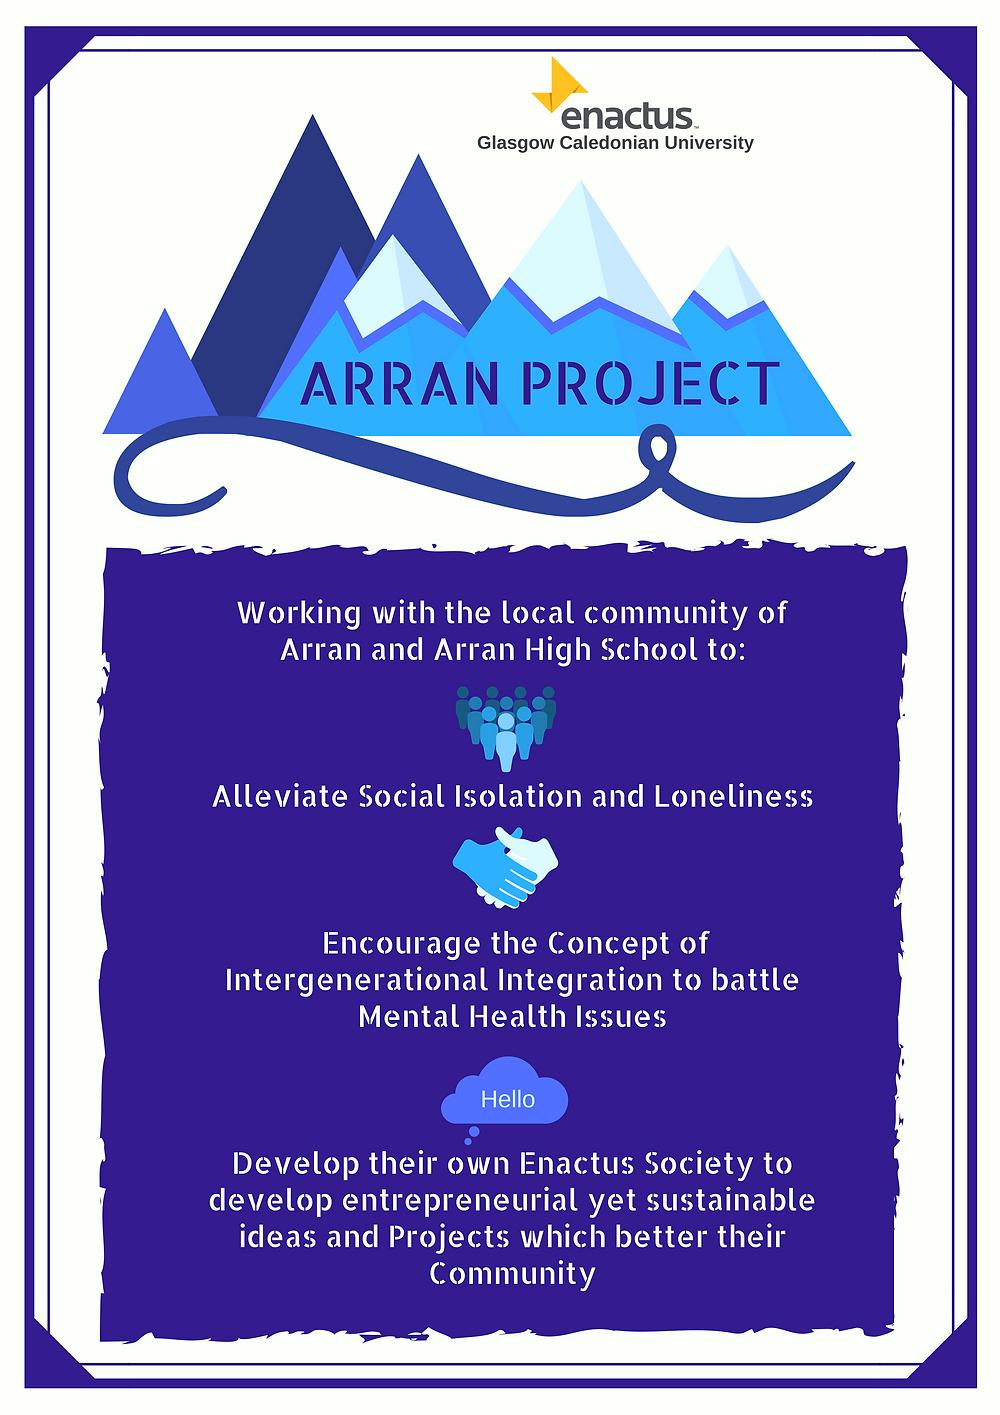 Arran Project Banner